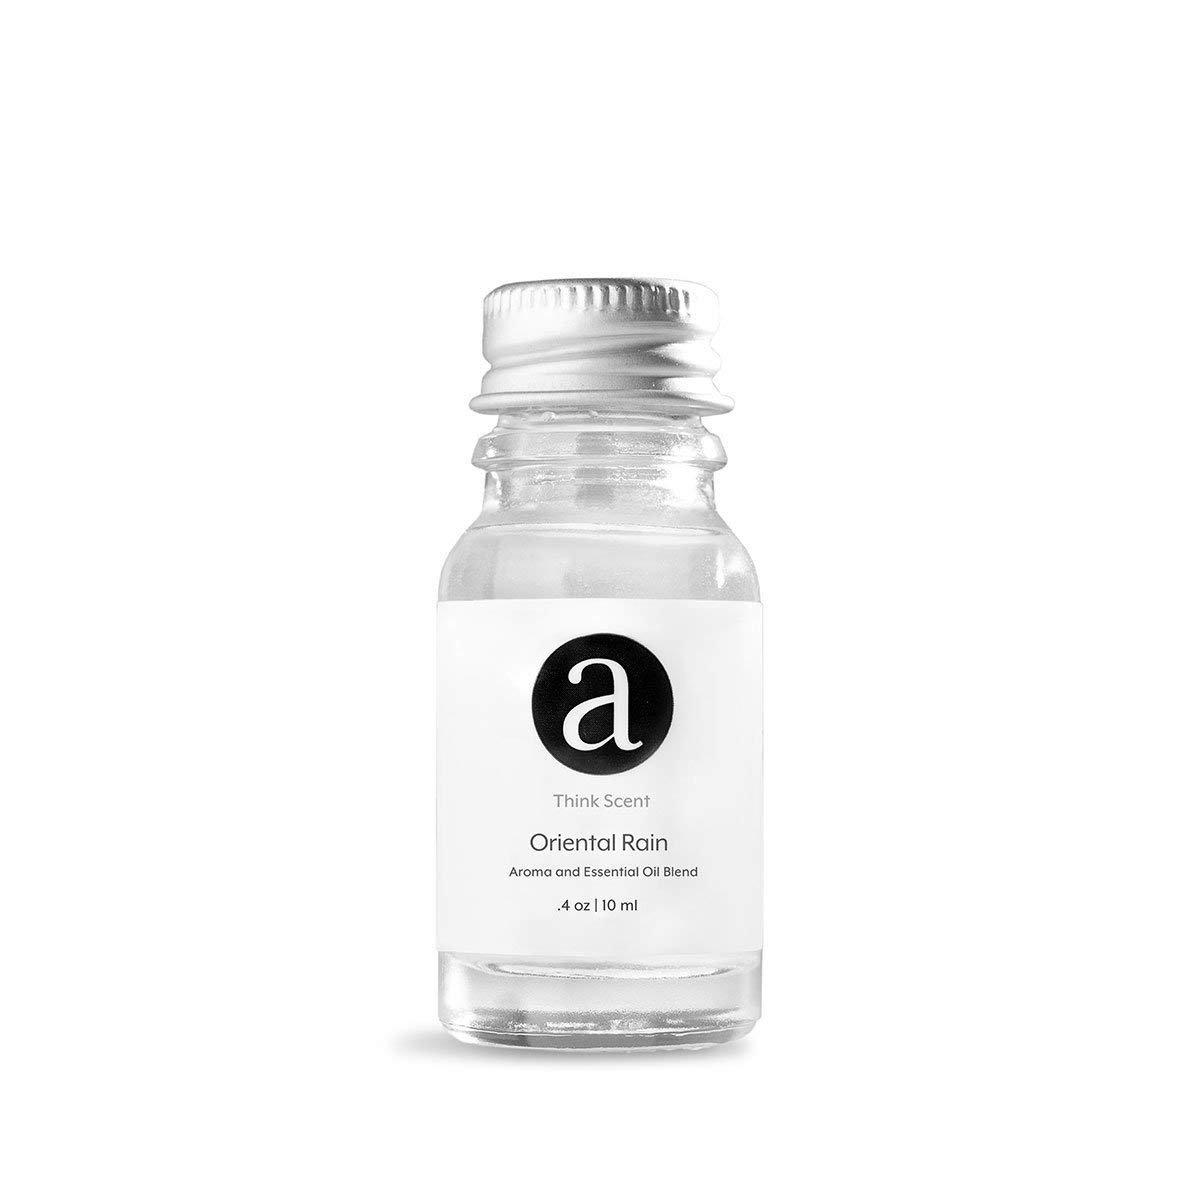 Oriental Rain Aroma Oil For AromaTech Scent Diffusers - 10 milliliter